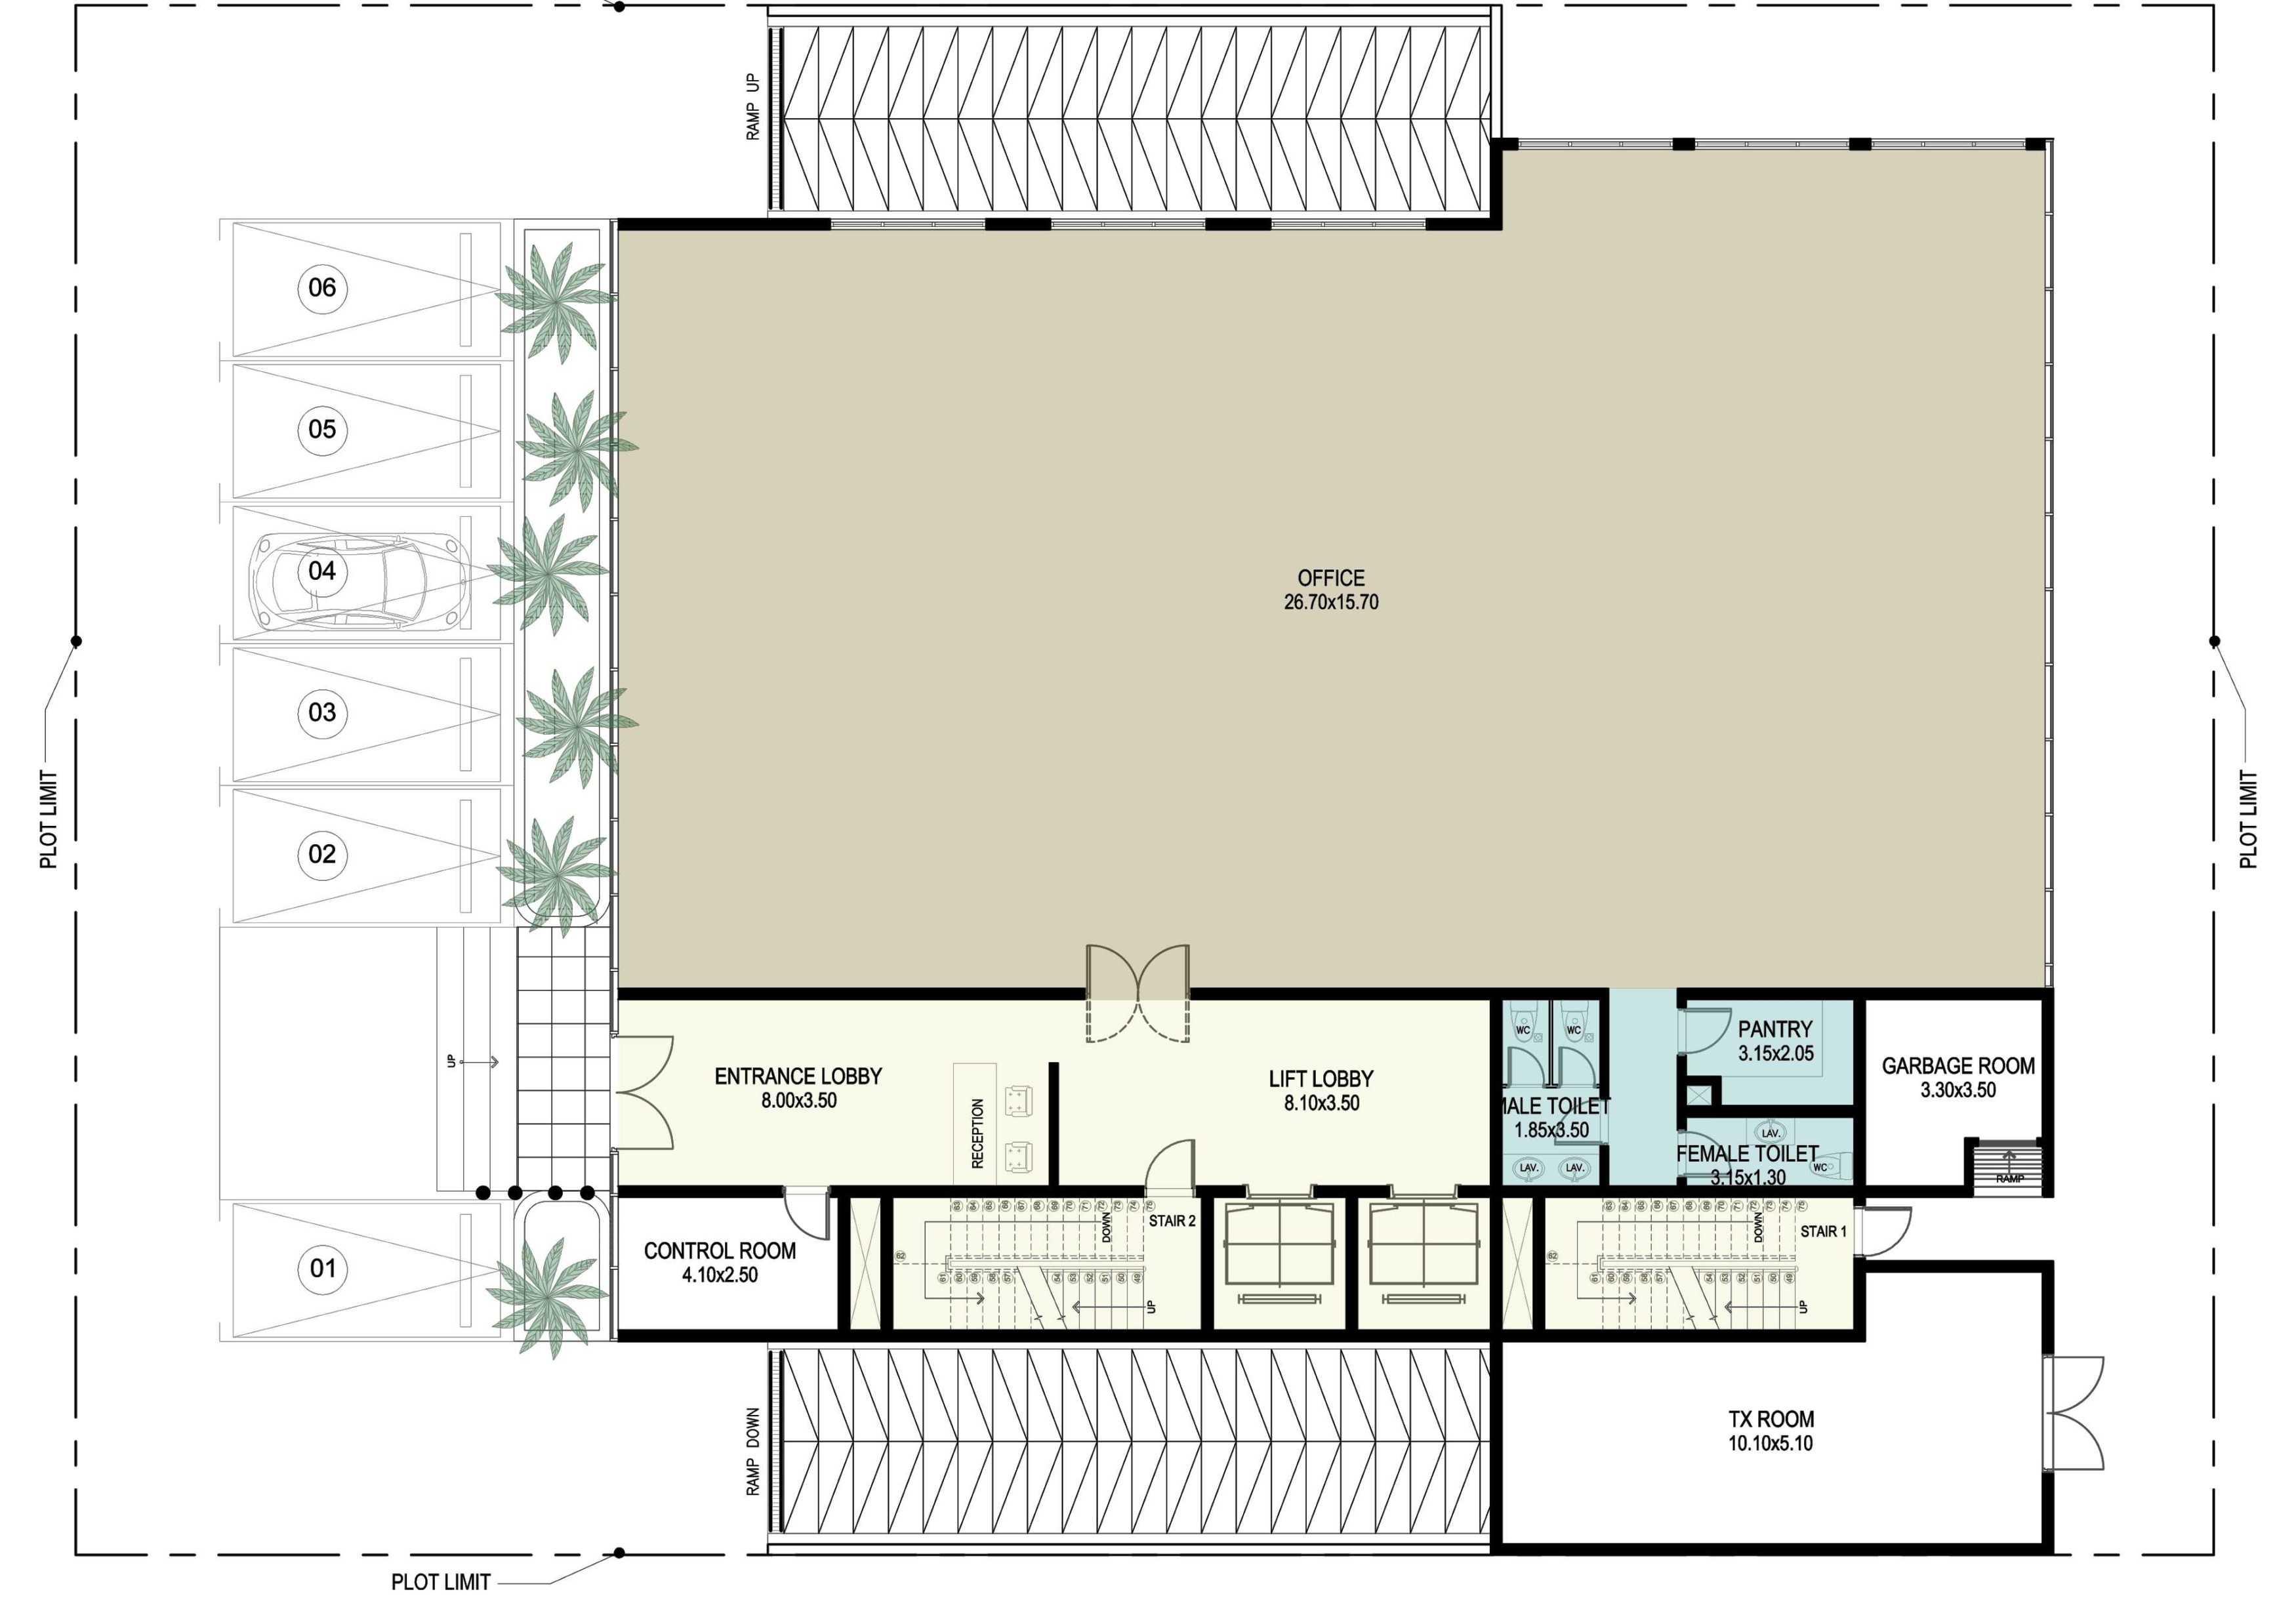 Ayu Fatmawati Al Bandary Office Rawdat Al Khail, Doha , Qatar Rawdat Al Khail, Doha , Qatar Ground Floor Plan   17785